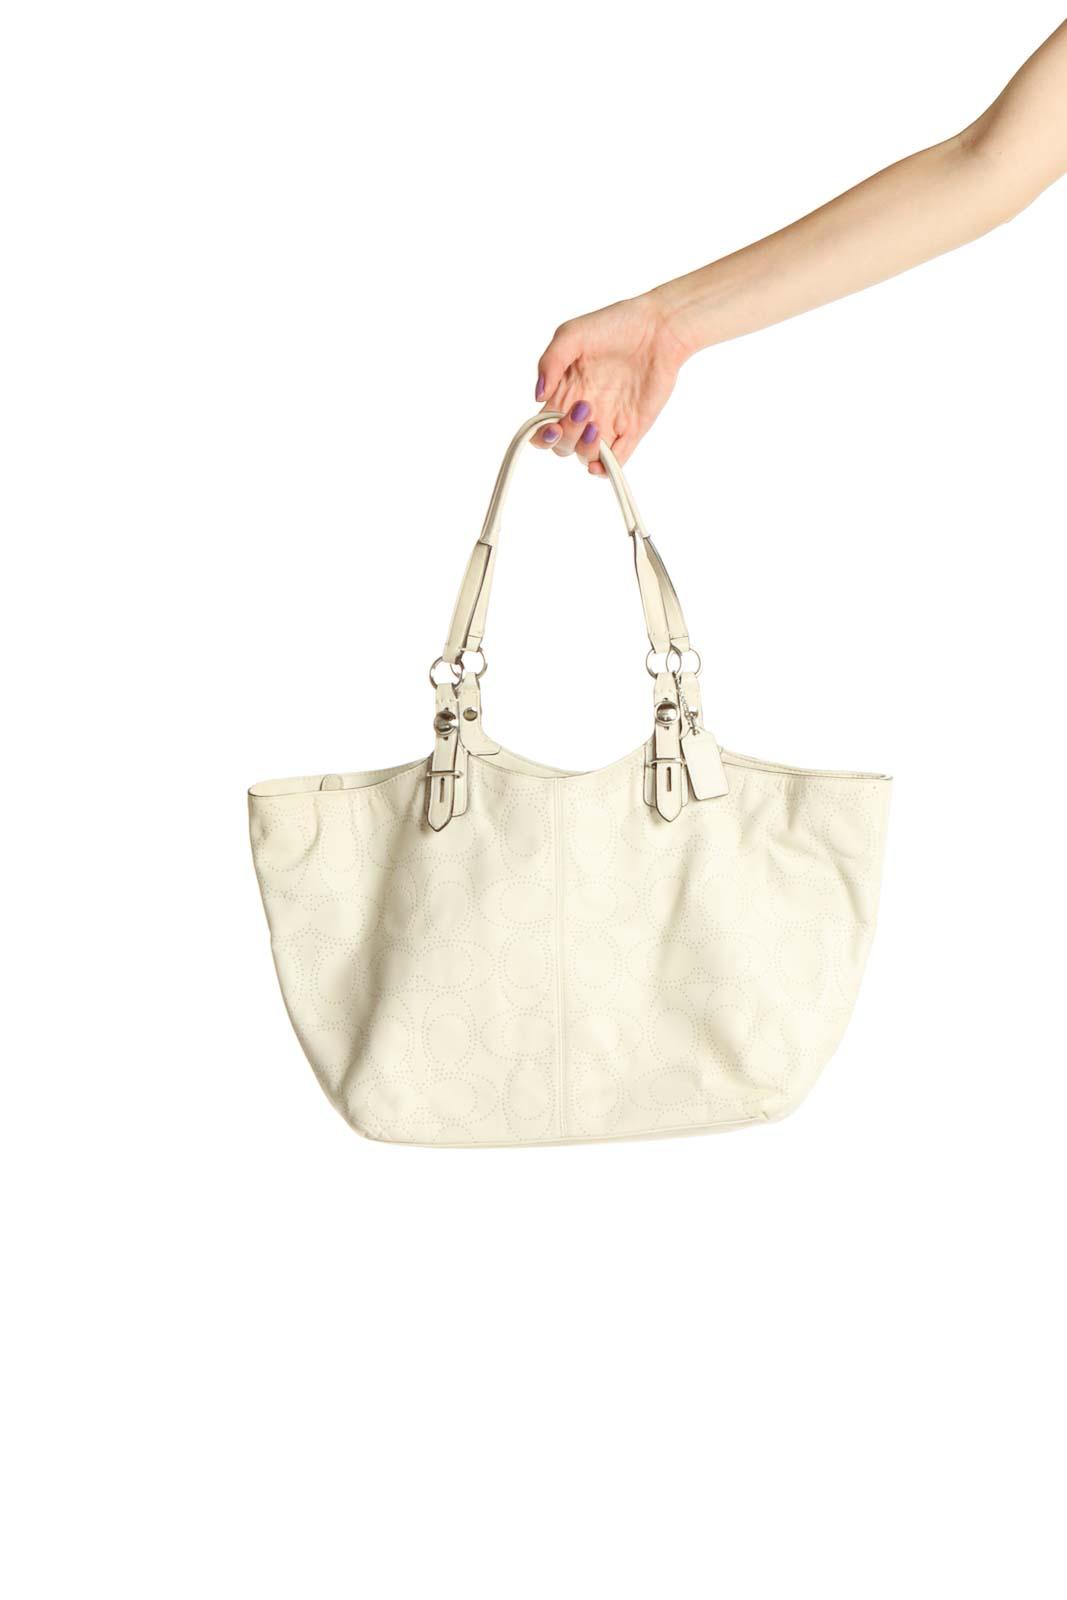 Cream Tote Bag Front